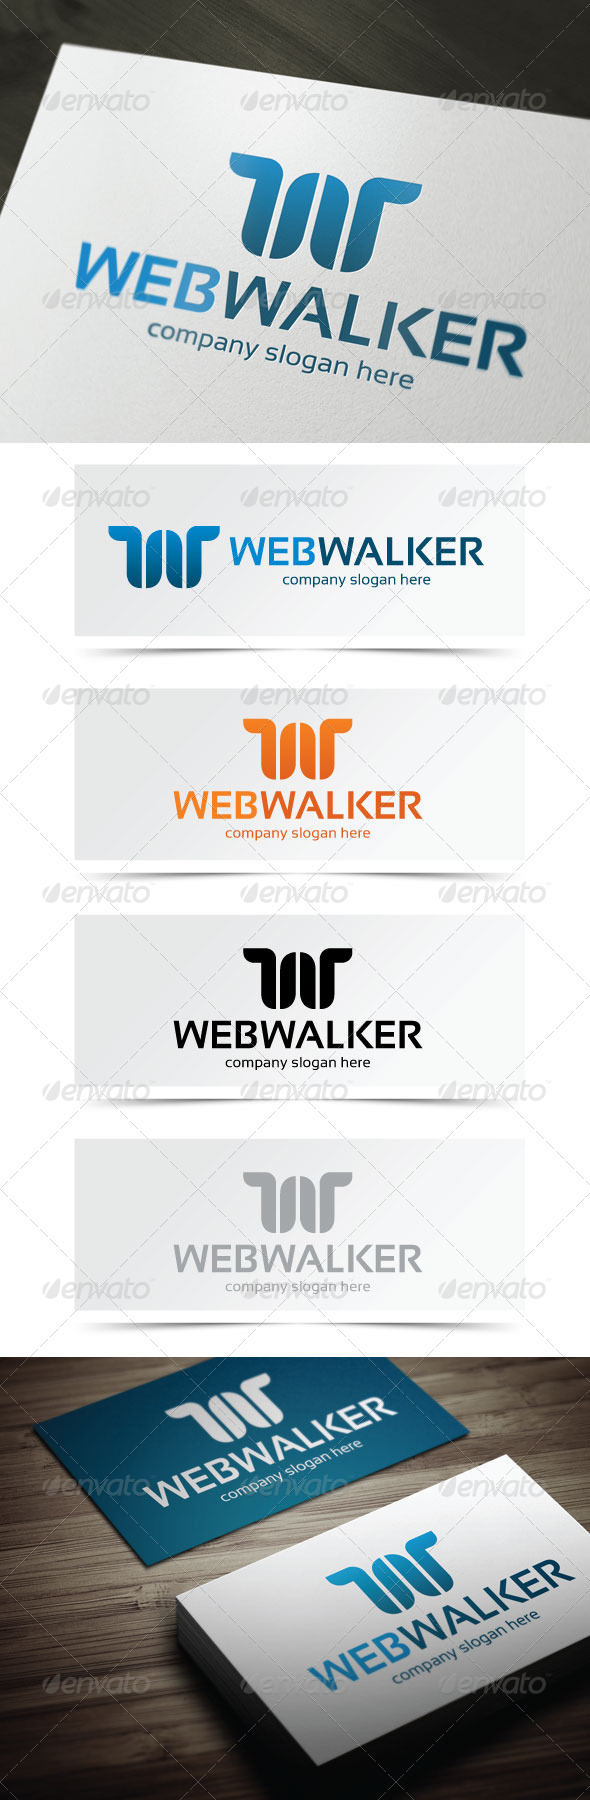 GraphicRiver Web Walker 5275429